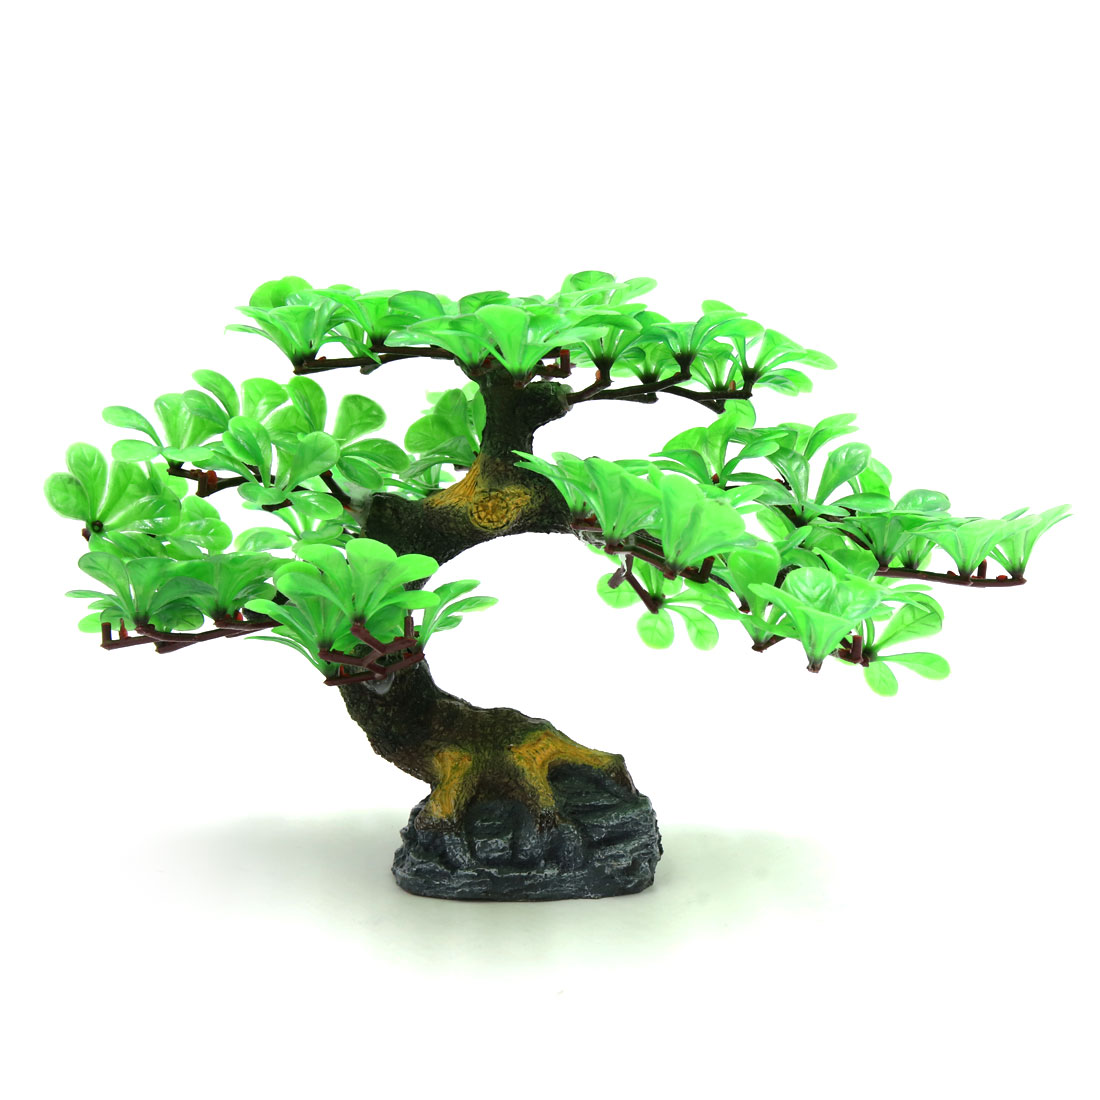 Green Plastic Decorative Tree Aquarium Betta Tank Waterscape Decoration Plant